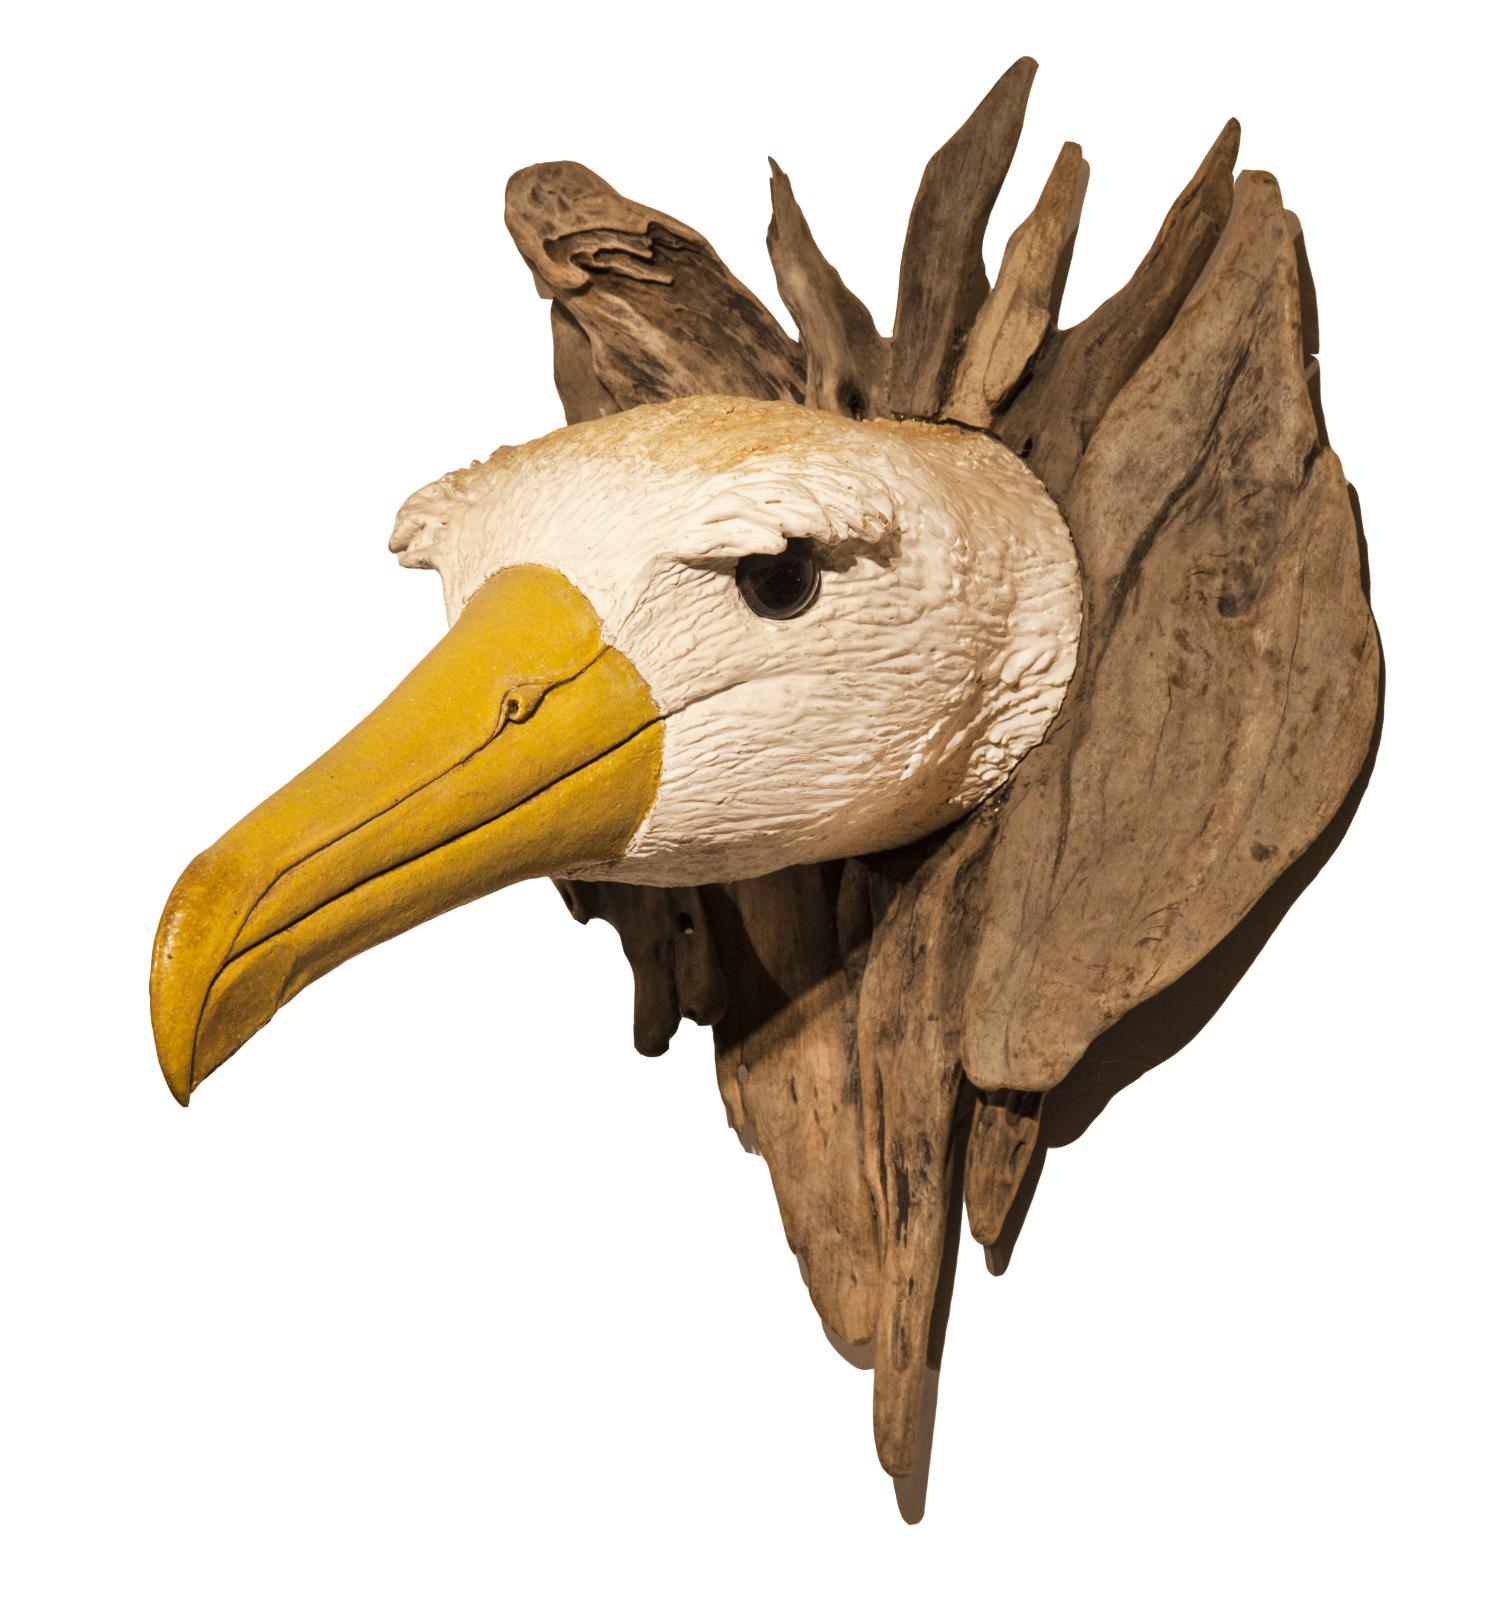 Lot 37 - Sculpture: Gail Dooley, Albatross Head, Ceramic and wood, Unique, 47cm high by 35cm wide by 45cm